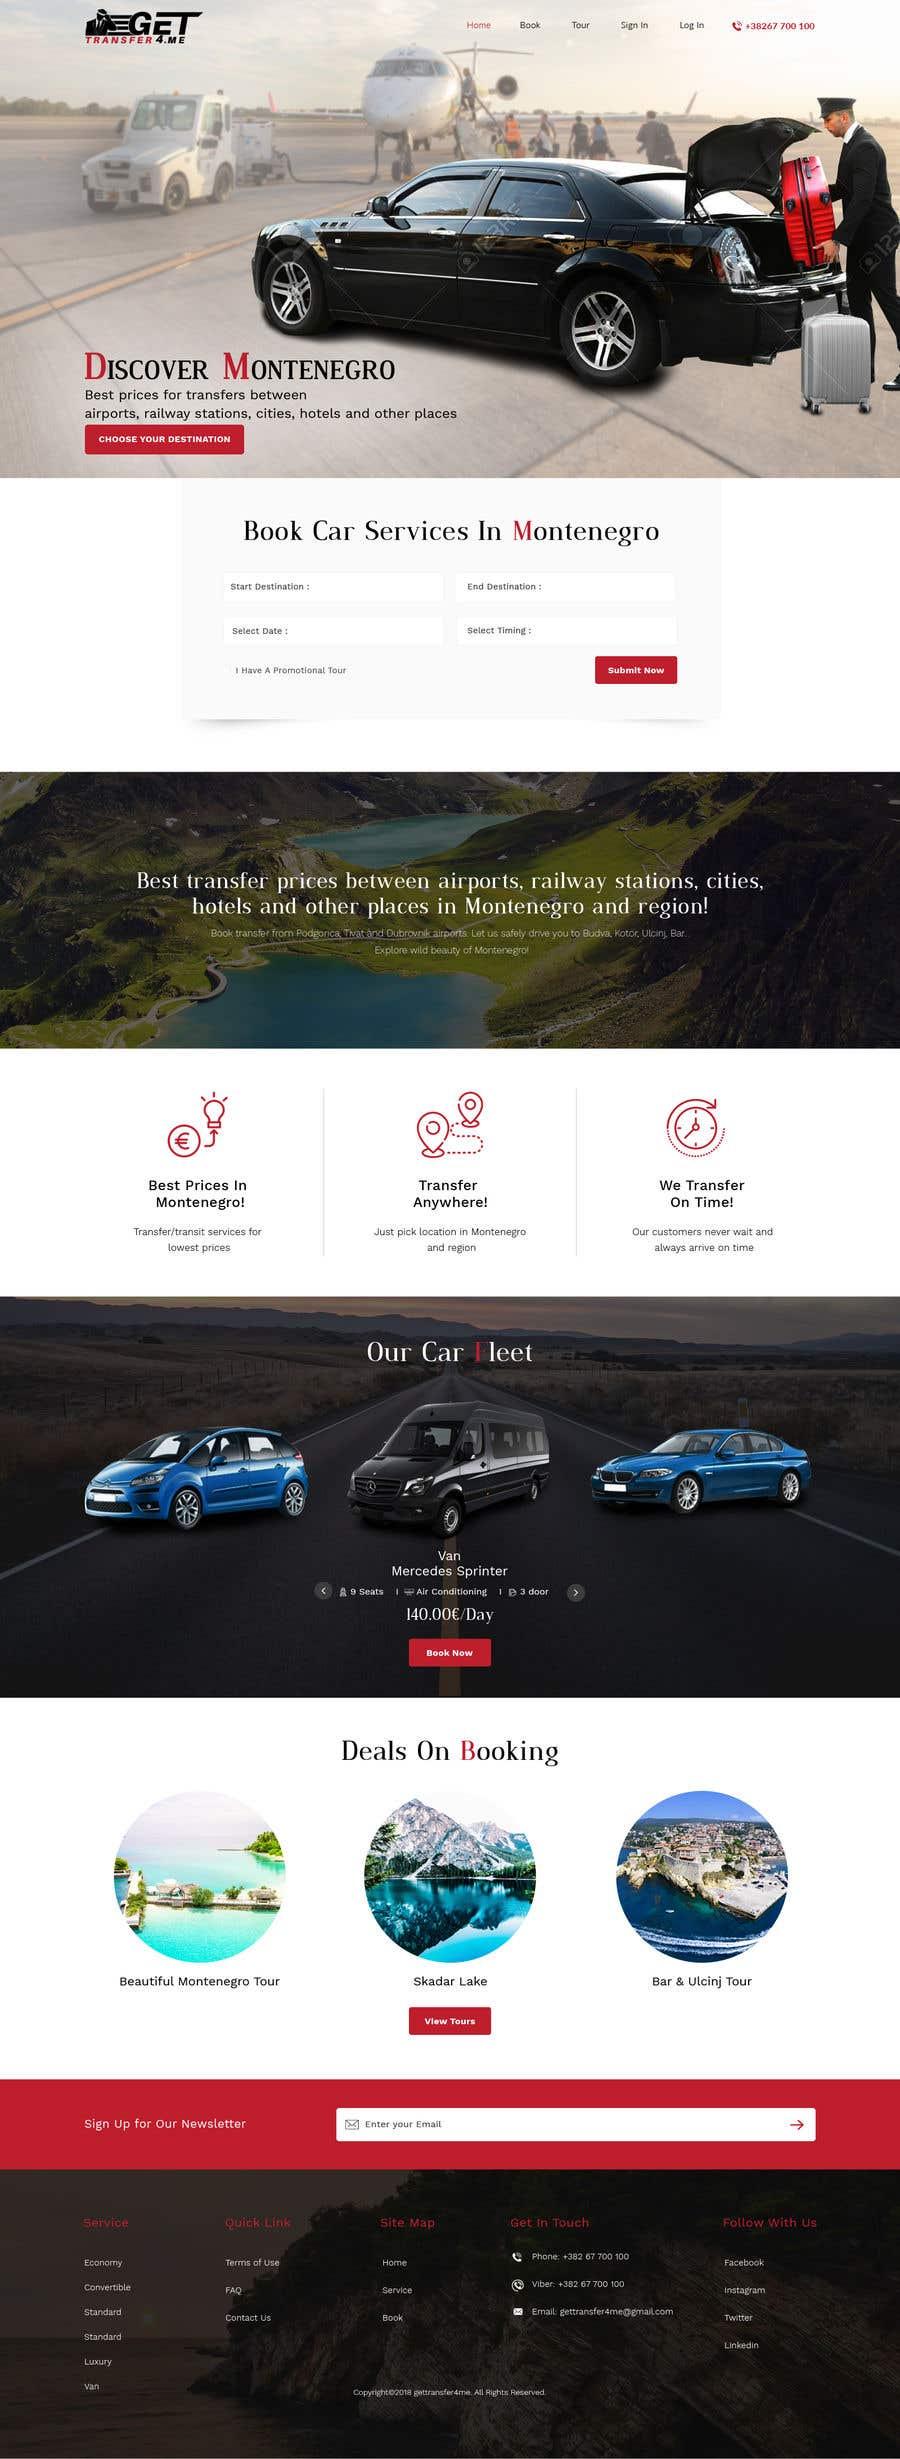 Kilpailutyö #12 kilpailussa Existing website - redesign